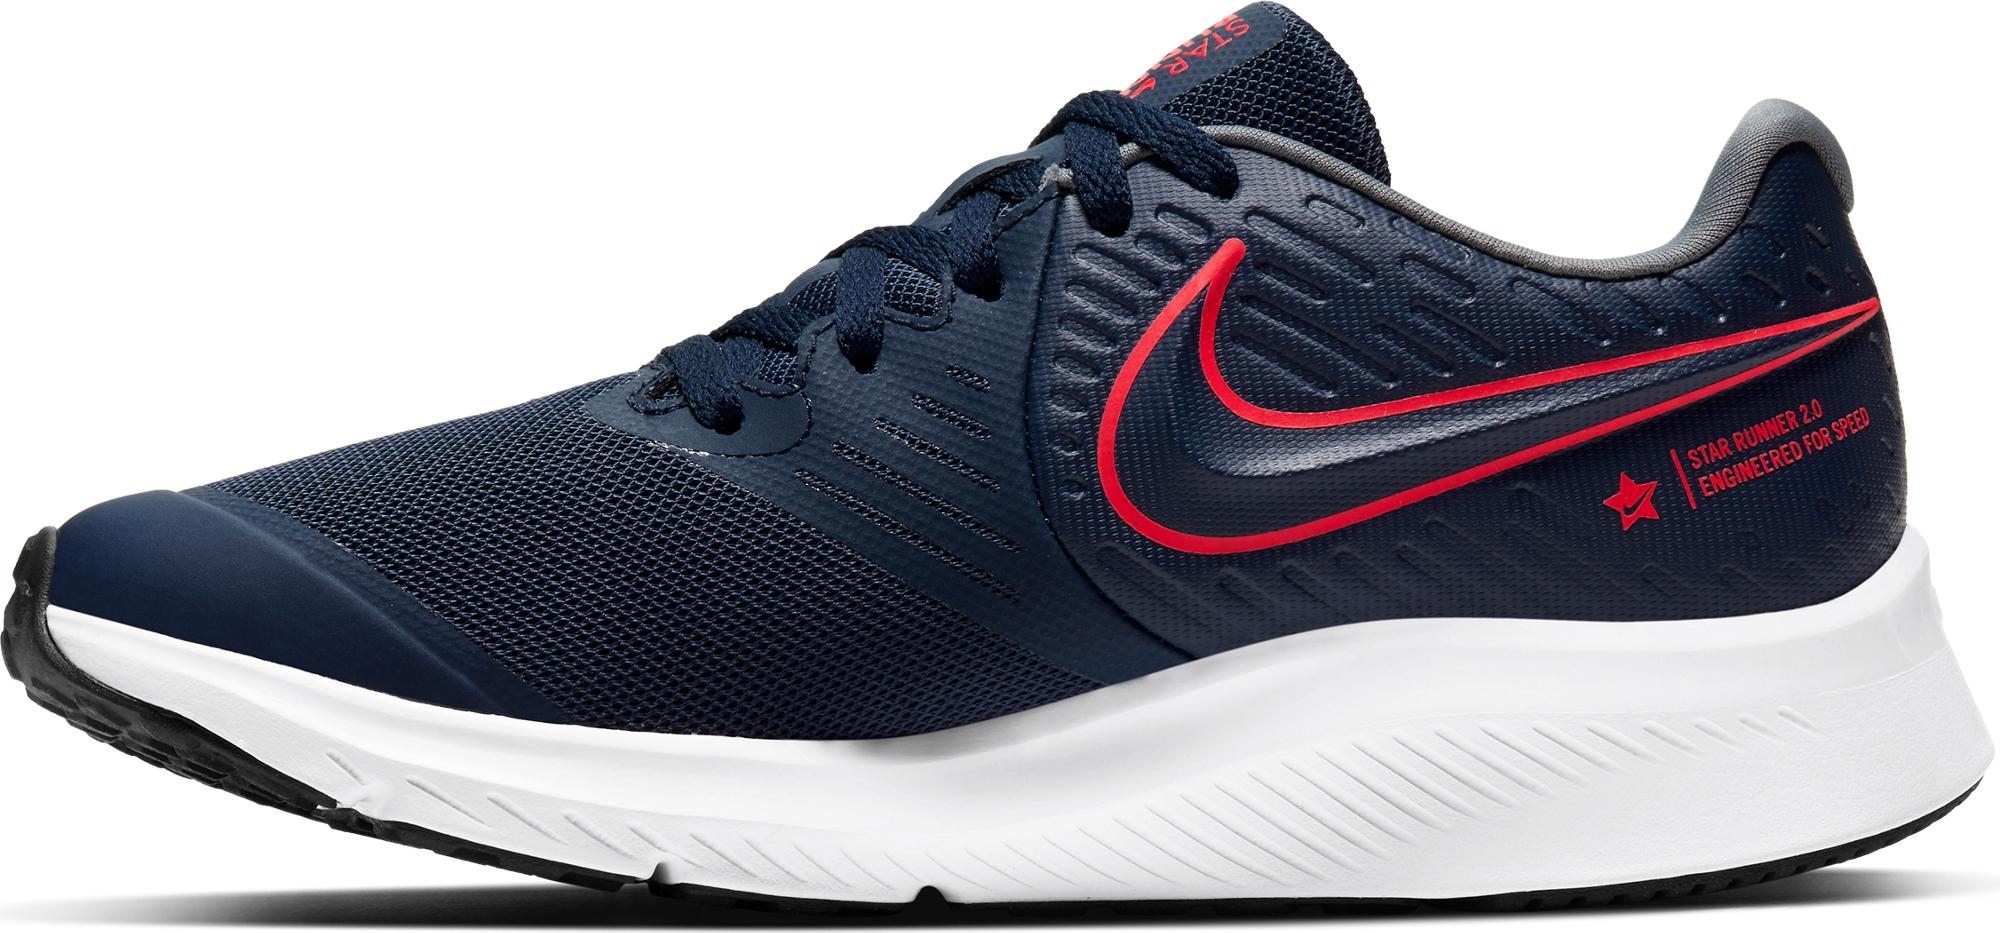 Nike Кроссовки для мальчиков Nike Star Runner 2 (GS), размер 34.5 кроссовки nike cortez basic ltr se gs shoe girls aa3043 001